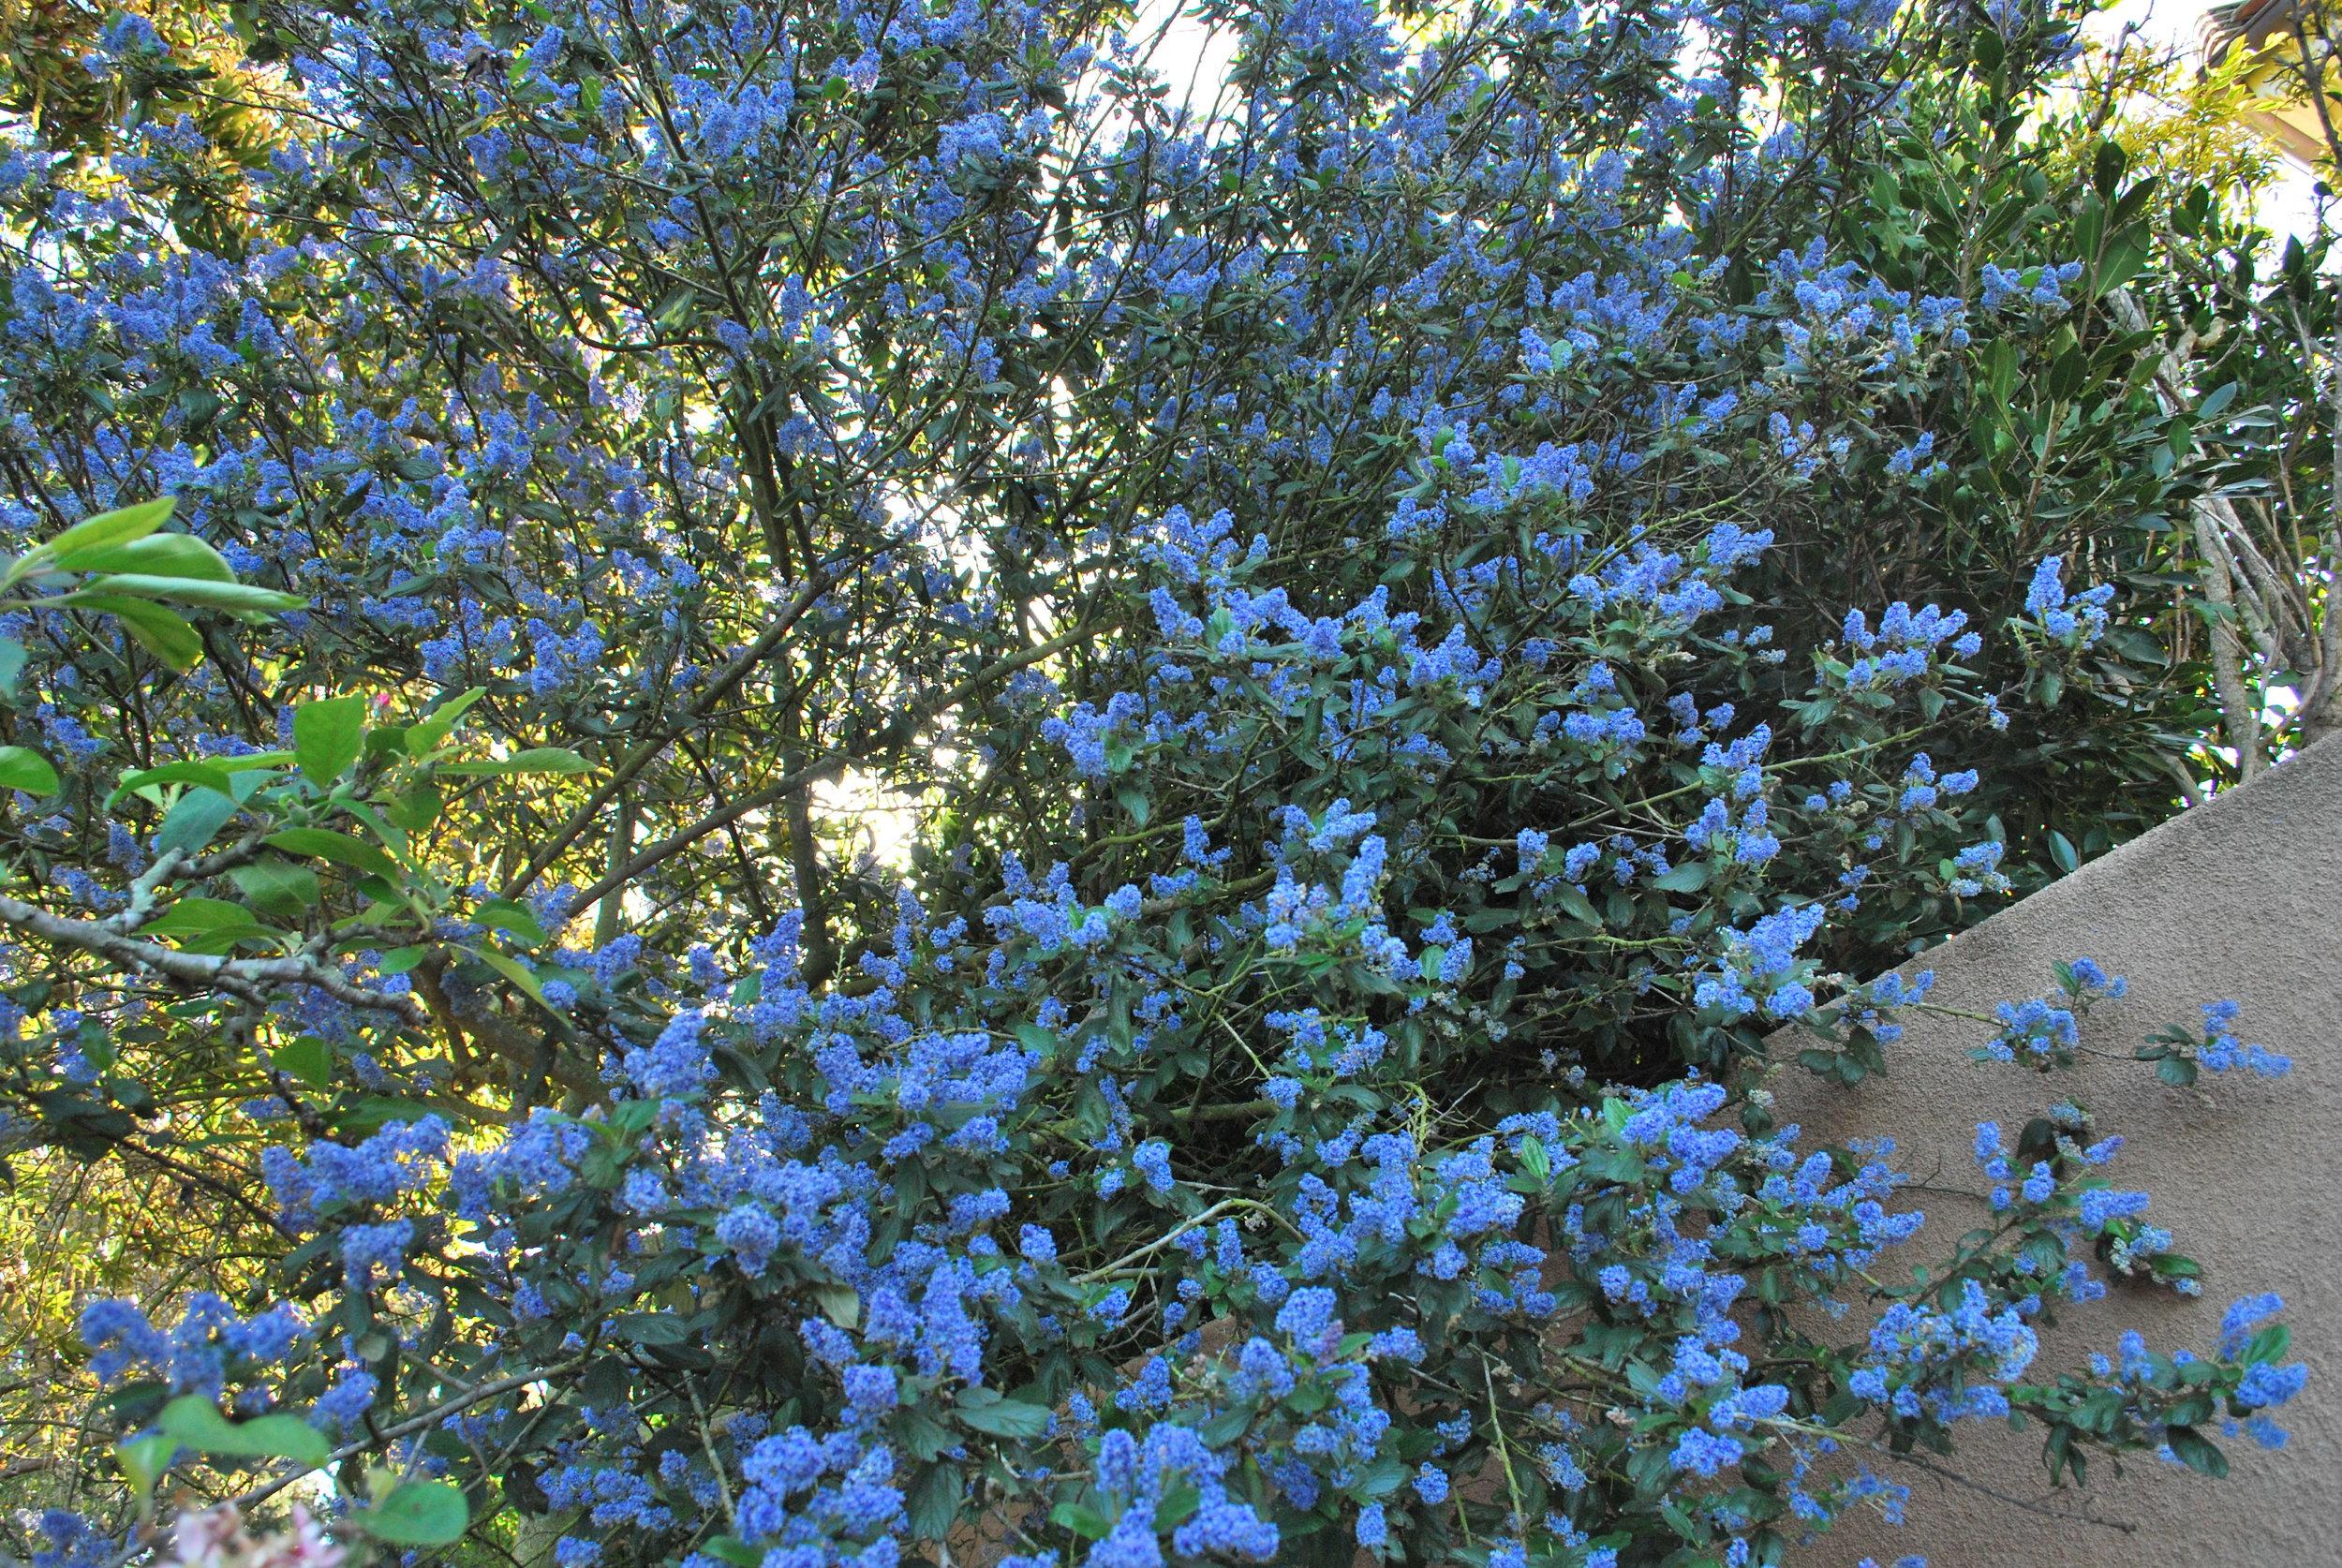 Native California Wild Lilac, Ceanothus 'Ray Hartman'